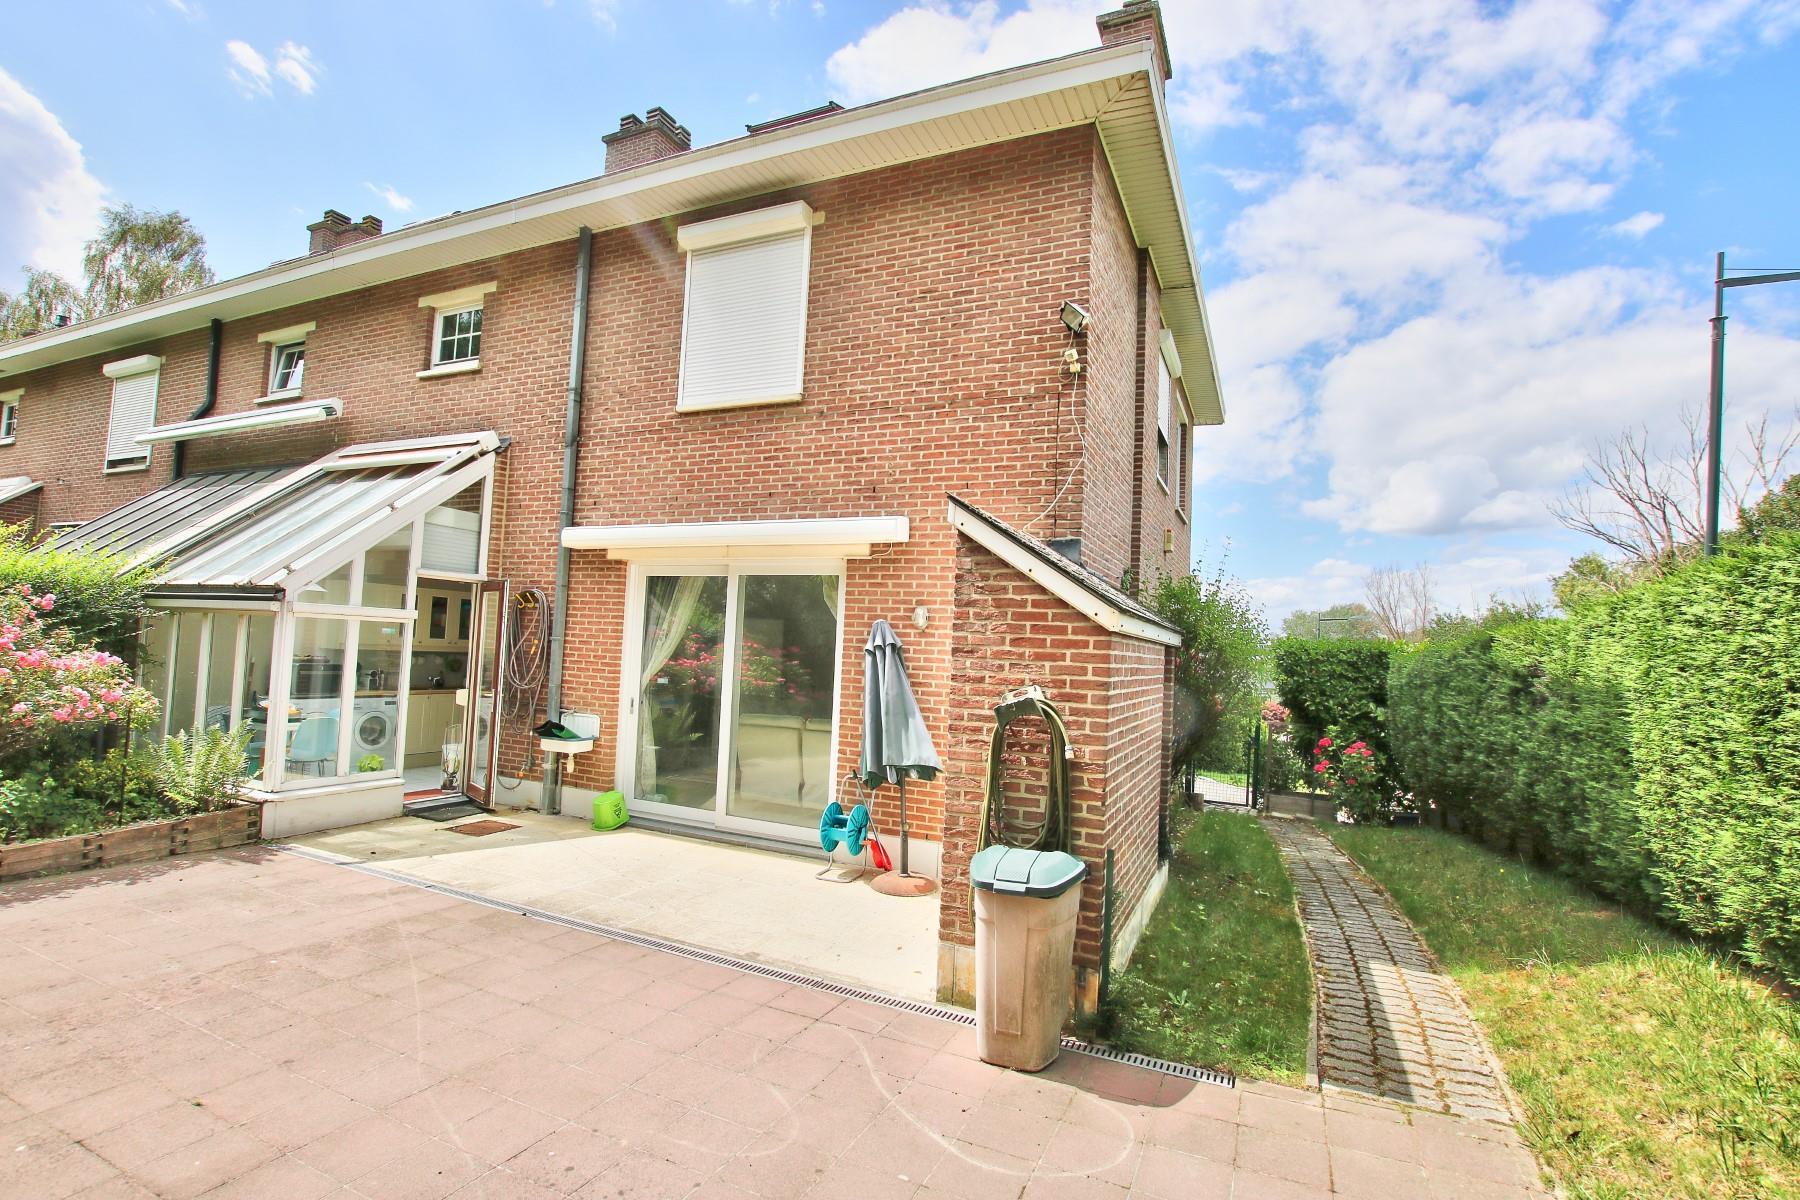 Huis - Woluwe-Saint-Lambert - #4103954-19